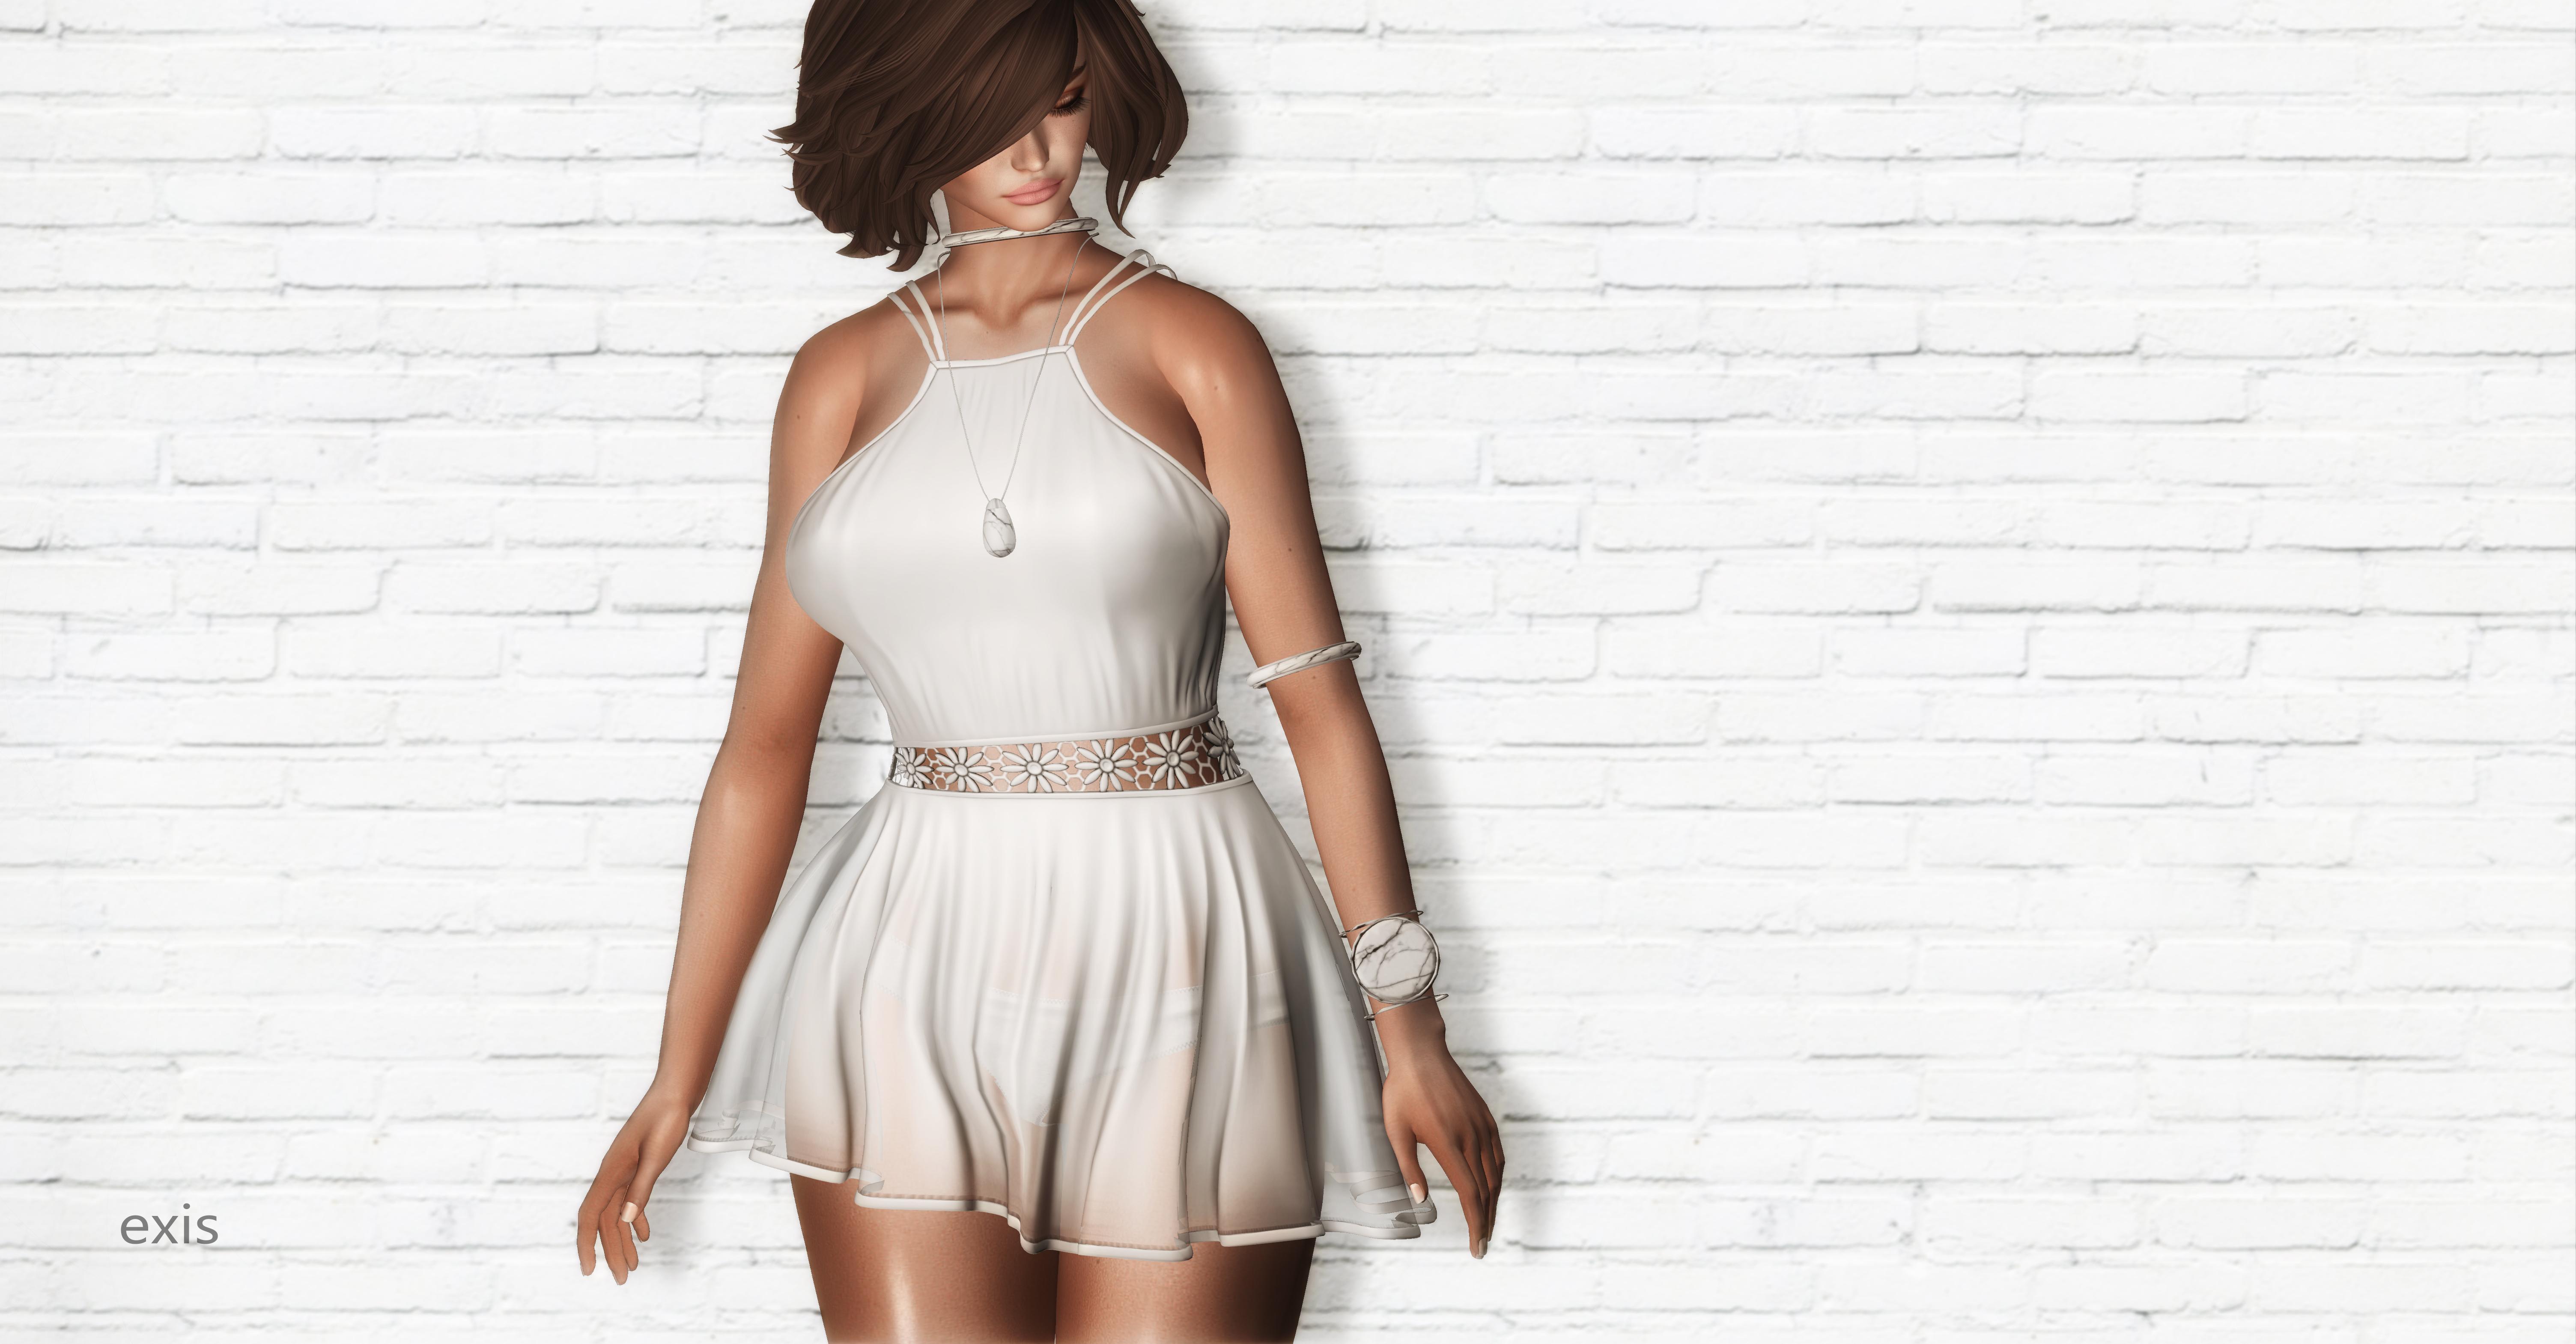 Hintergrundbilder : Modell-, lange Haare, Fotografie, Kleid, Muster ...